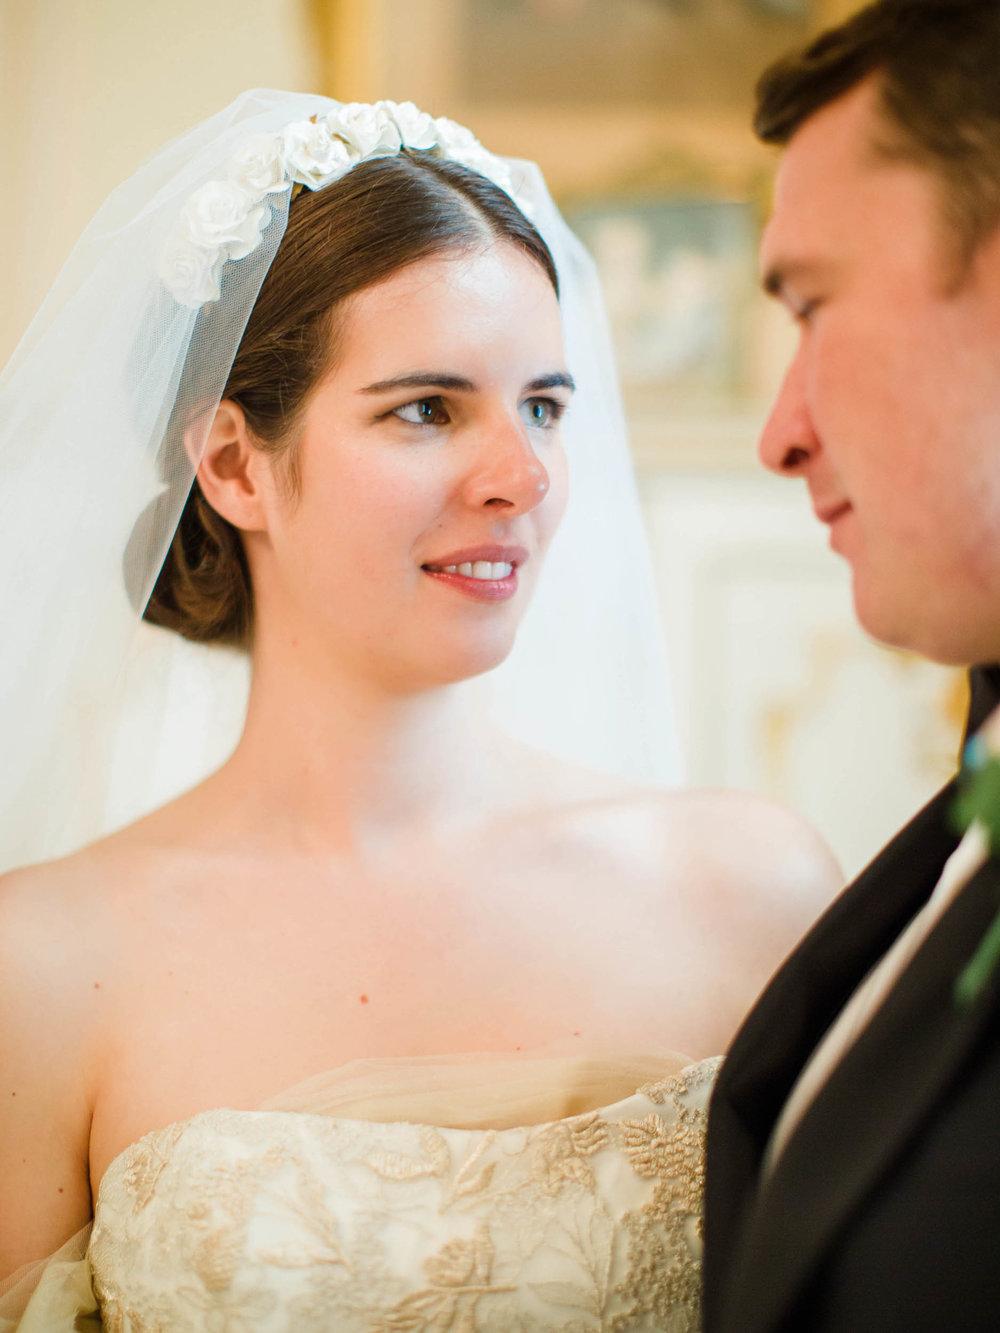 Amy O'Boyle Photography- Destination & UK Fine Art Film Wedding Photographer- Stoneleigh Abbey Wedding-60.jpg